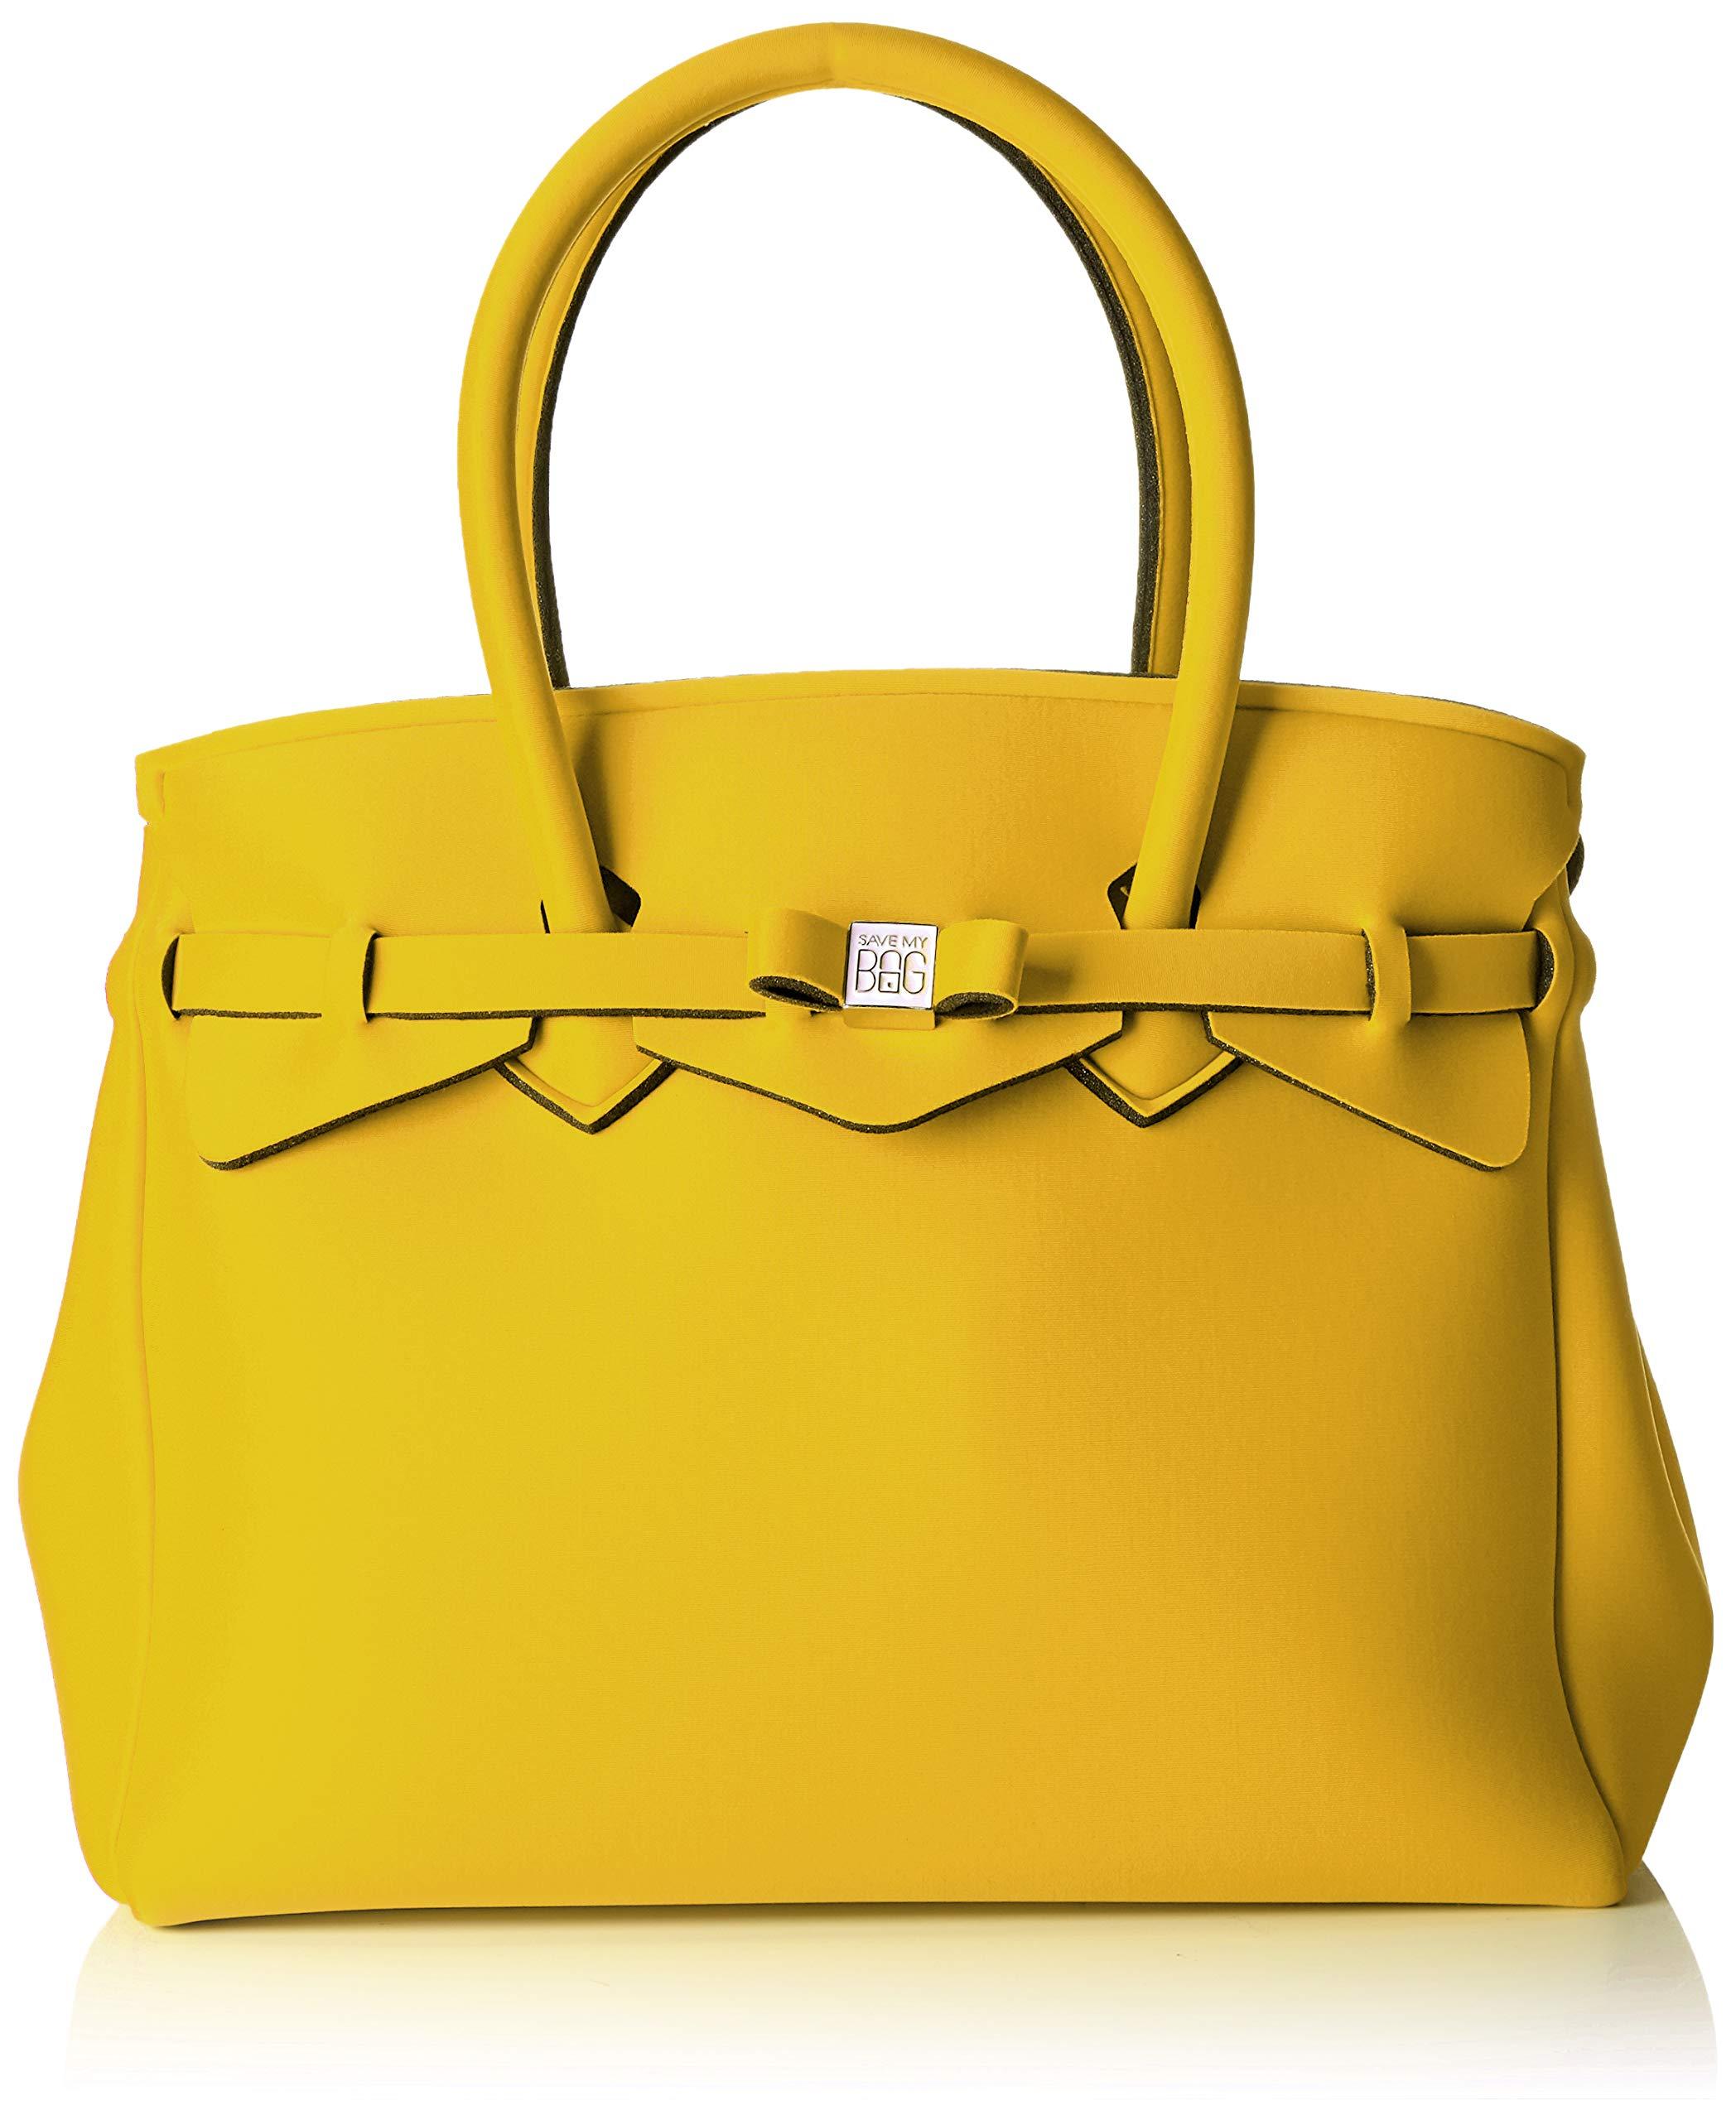 My Bag 20204nSac LEu Save FemmeJaunerabat Bandoulière Rab34x29x18 Cmw X H 8nO0wPkX